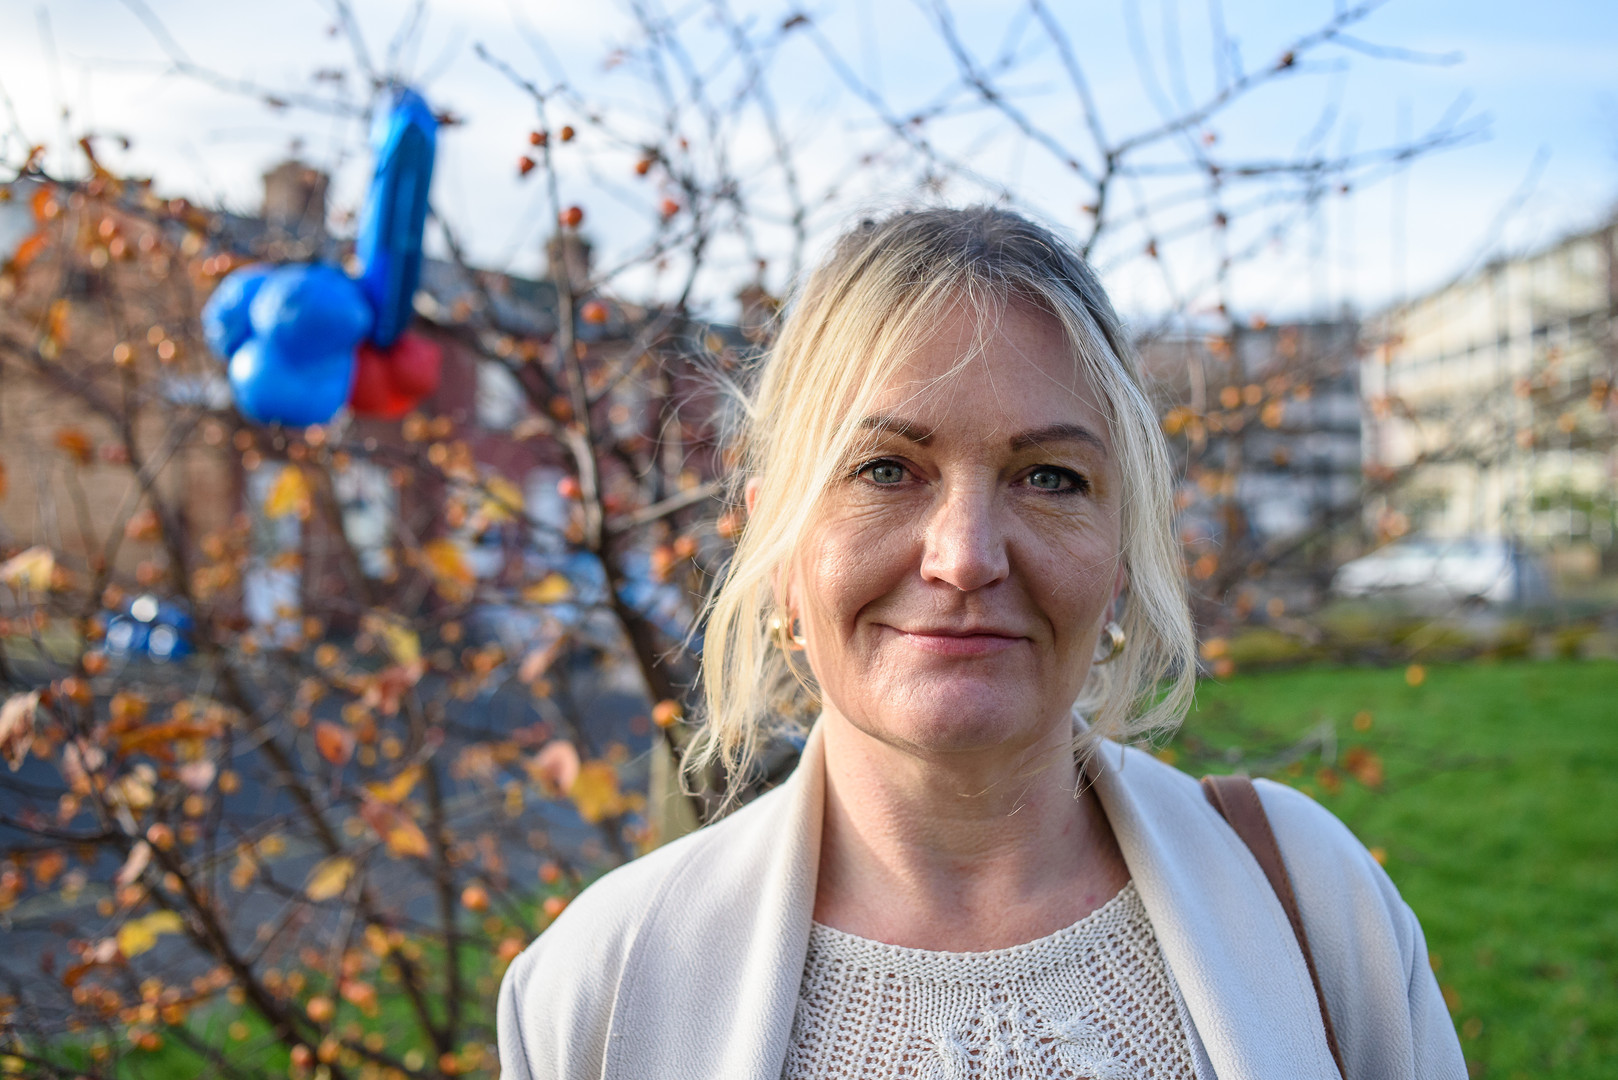 Sandra Kelleher,Resident of The Liberties, Shannon's Hopeline, Meath Street